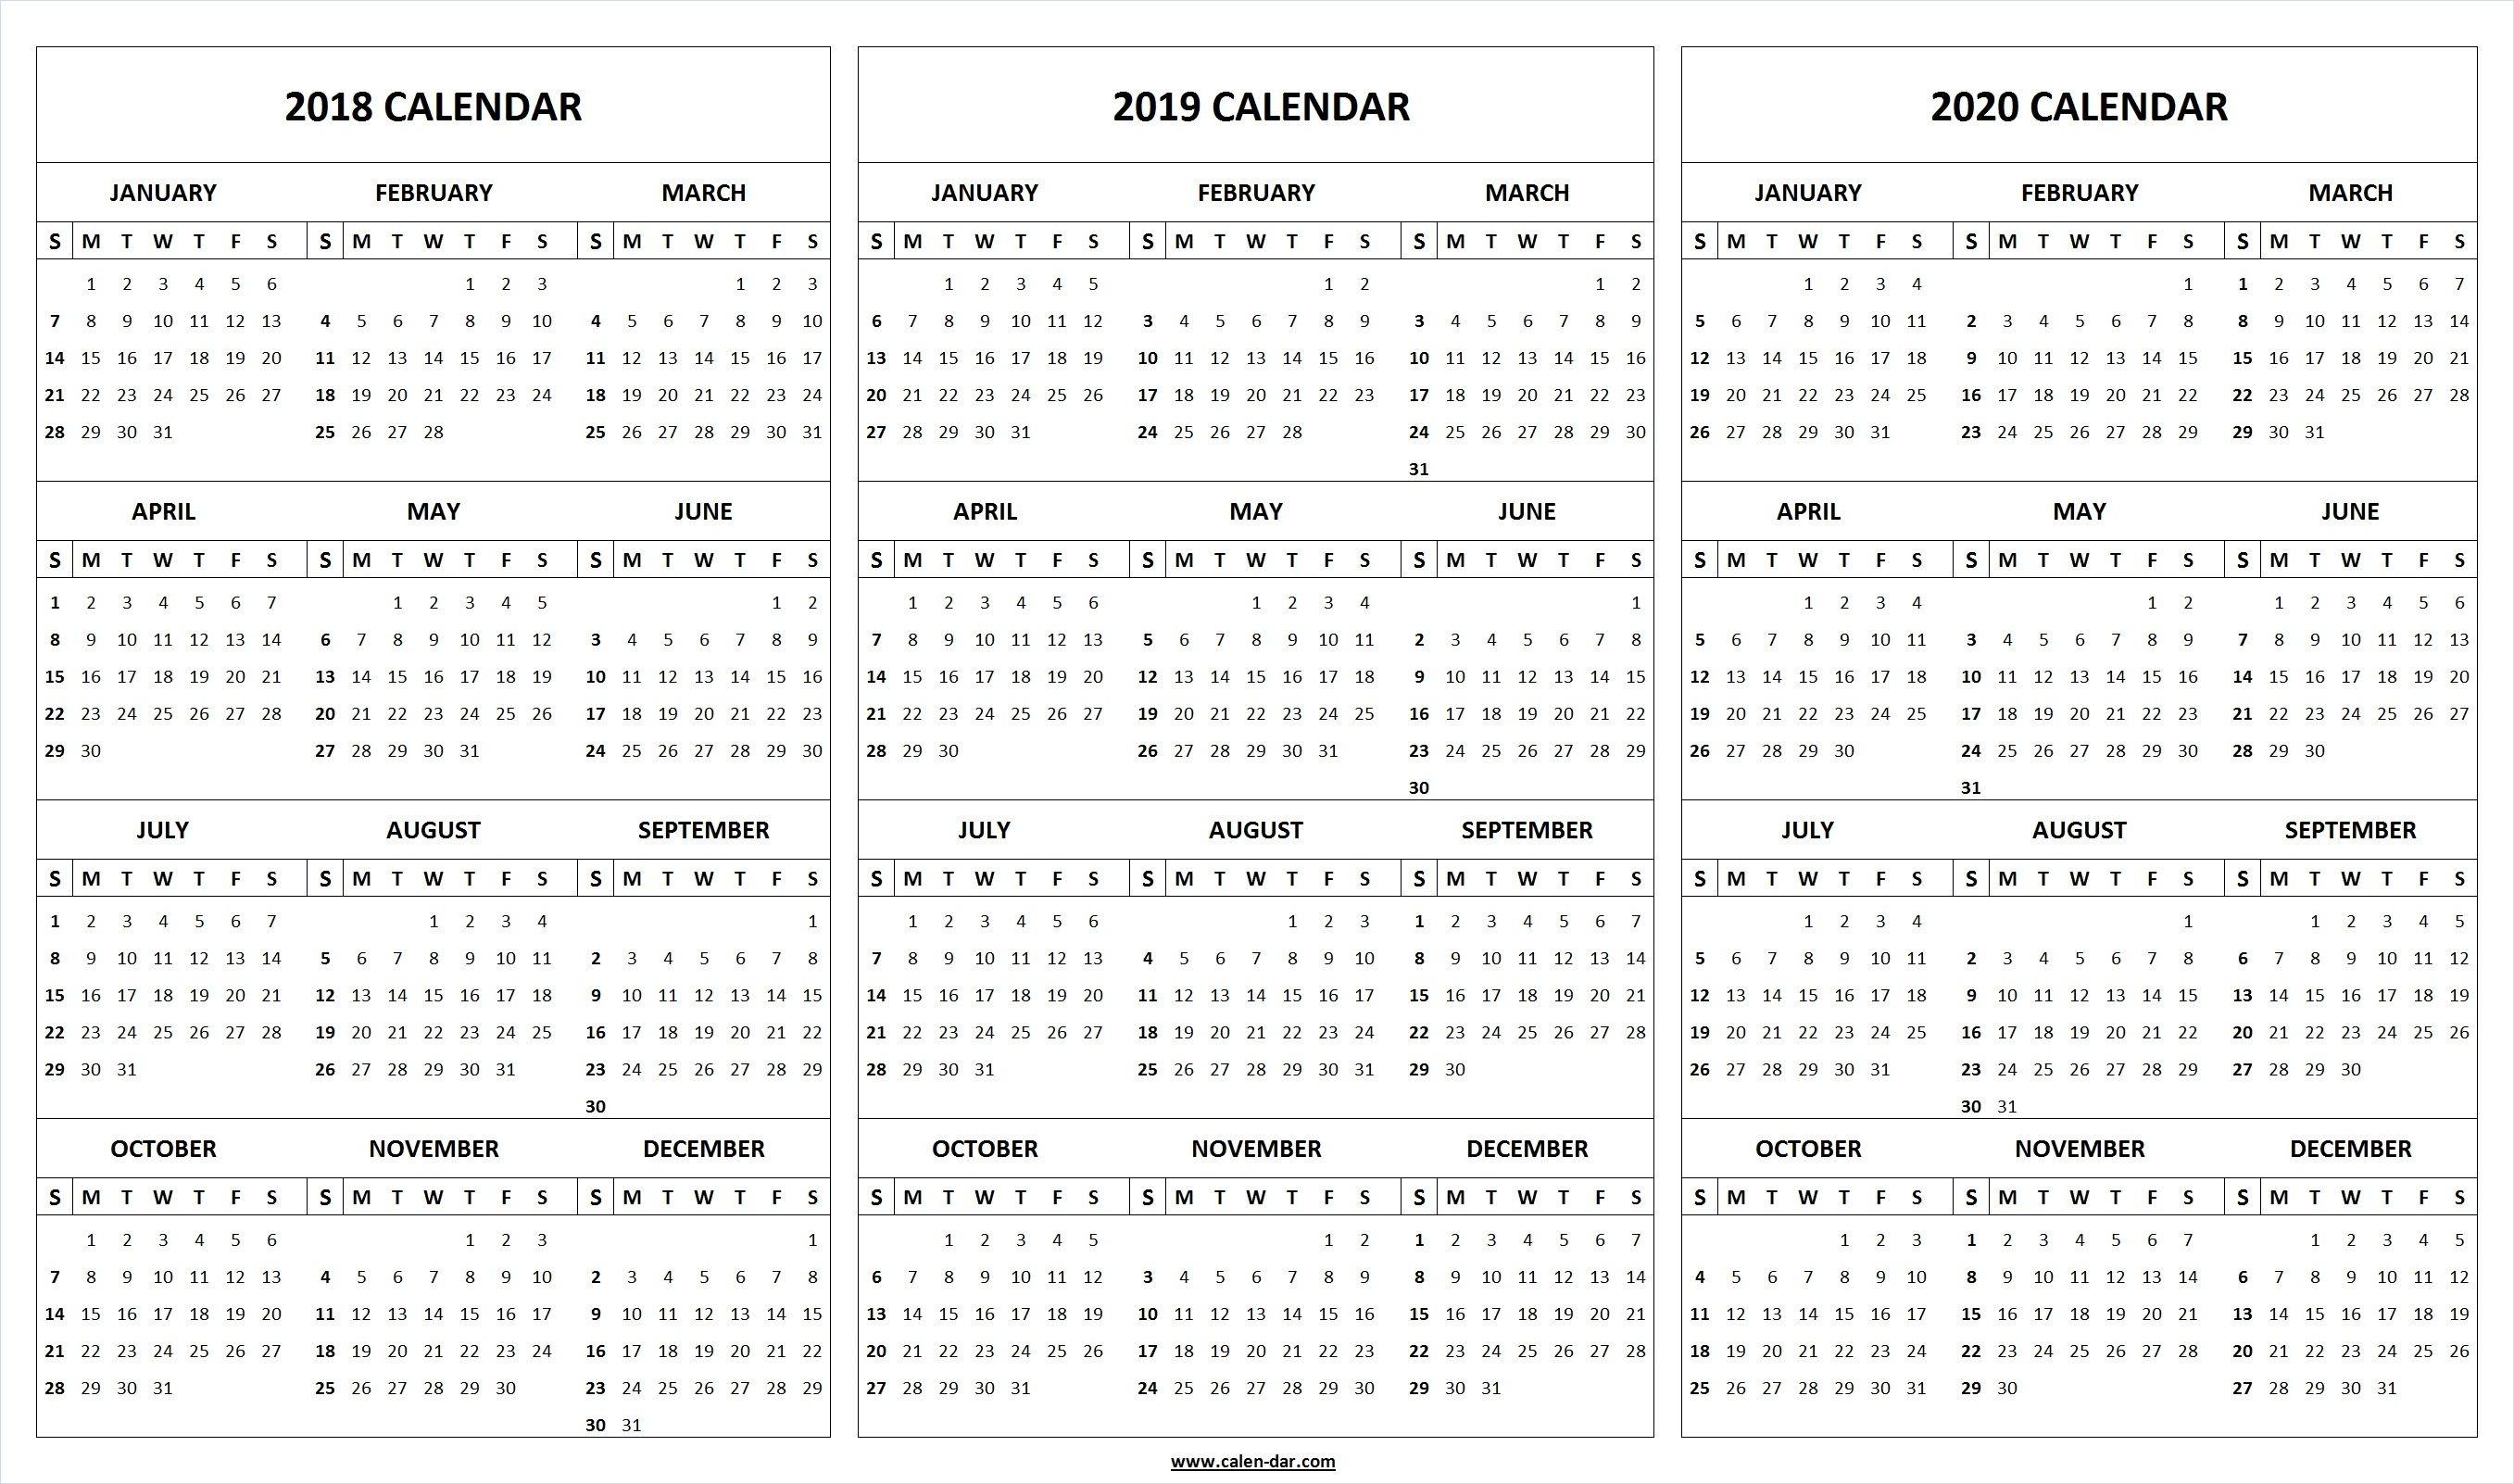 Print Blank 2018 2019 2020 Calendar Template | Organize! | Printable in 2019 - 2020 Printable Fill In Calendar